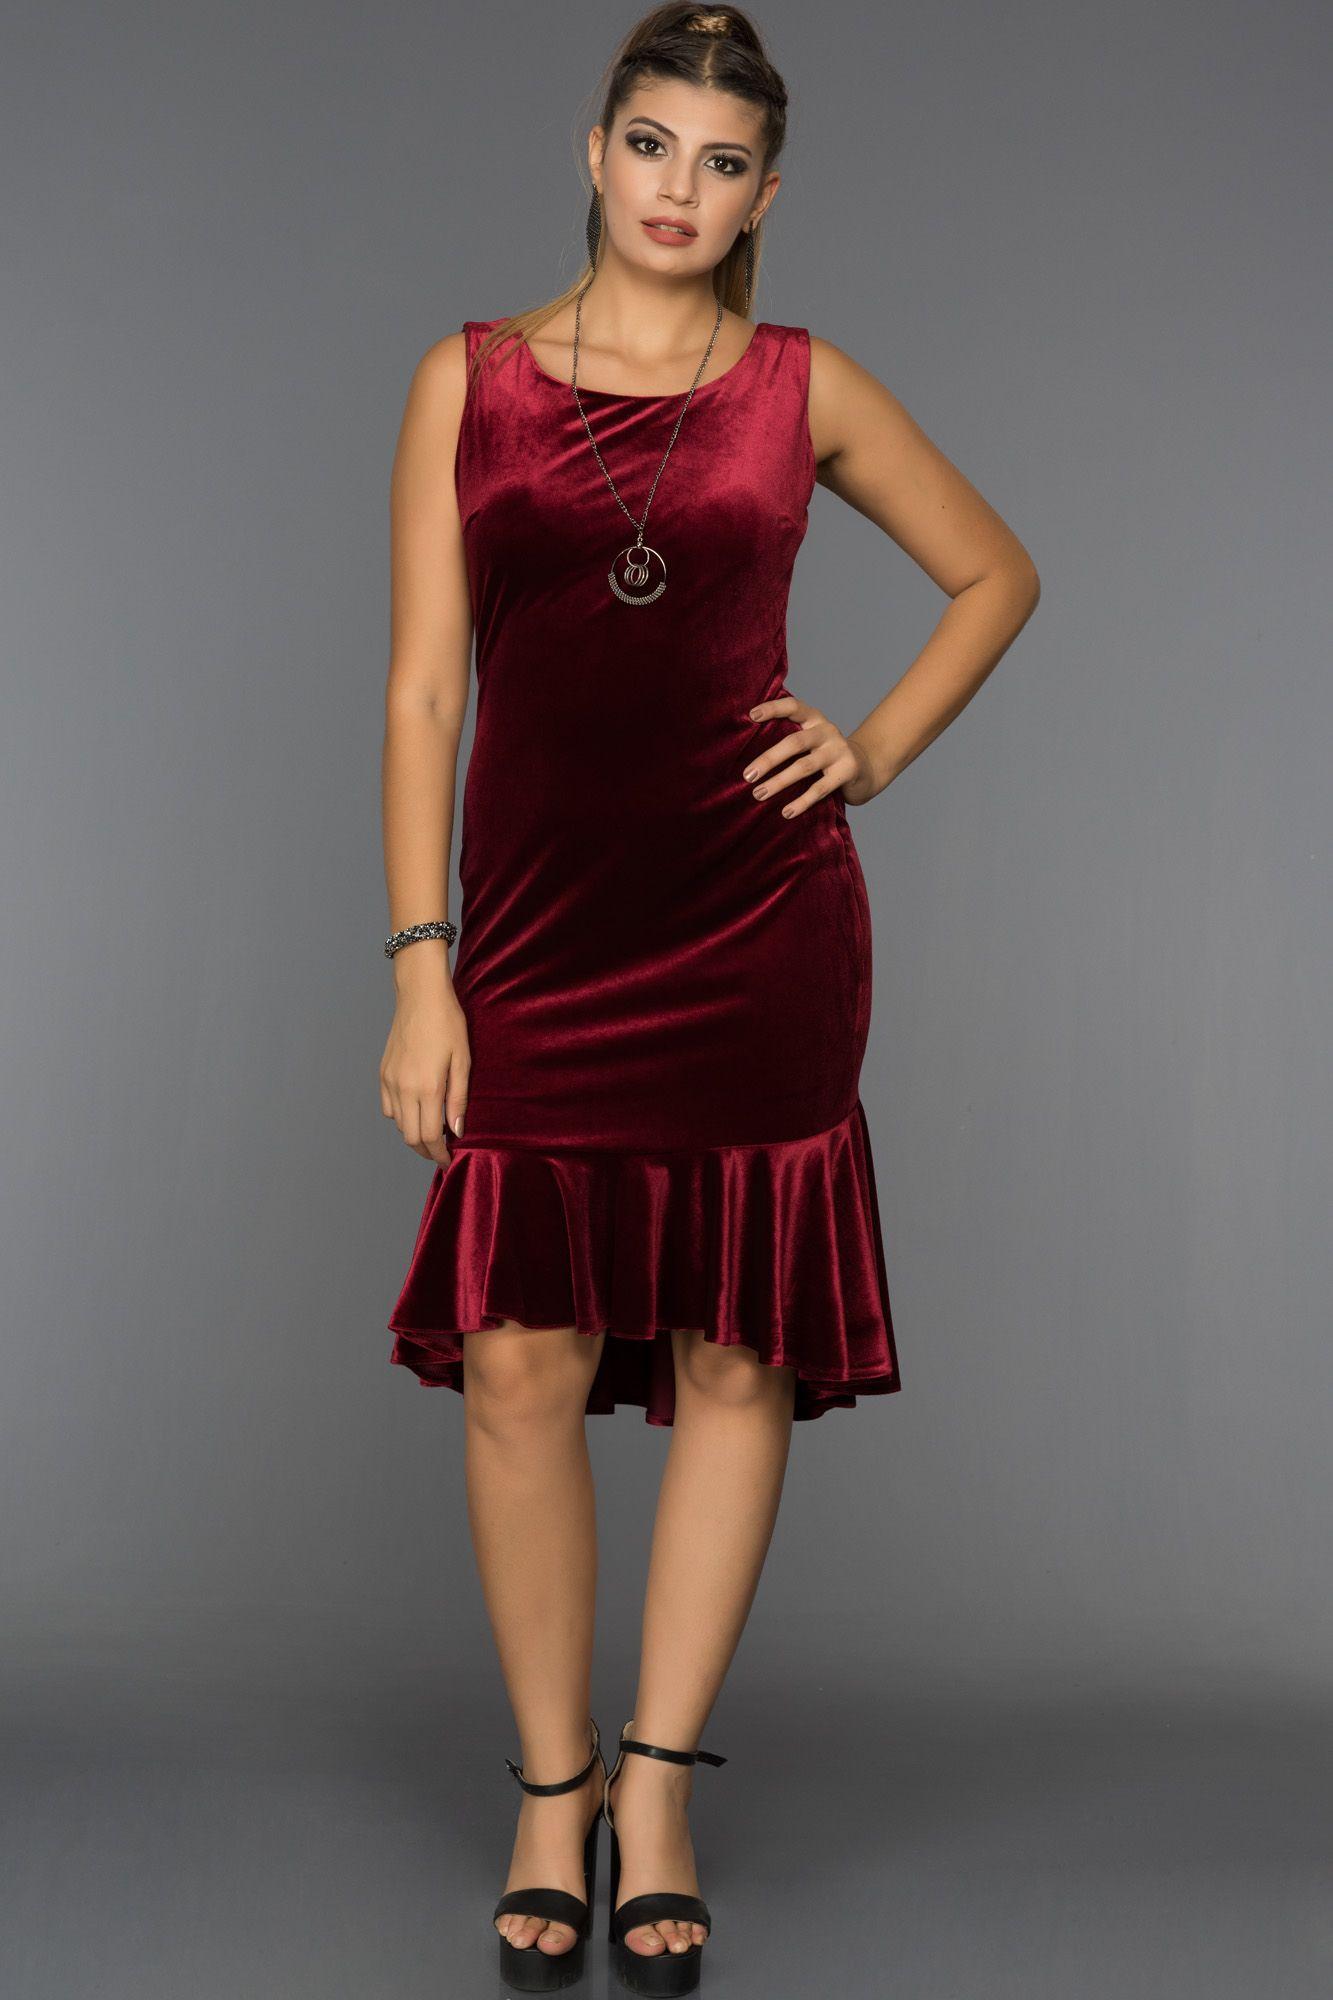 Midi Boy Elbise Modelleri Kadinev Com Elbise Modelleri Elbise Maksi Elbiseler